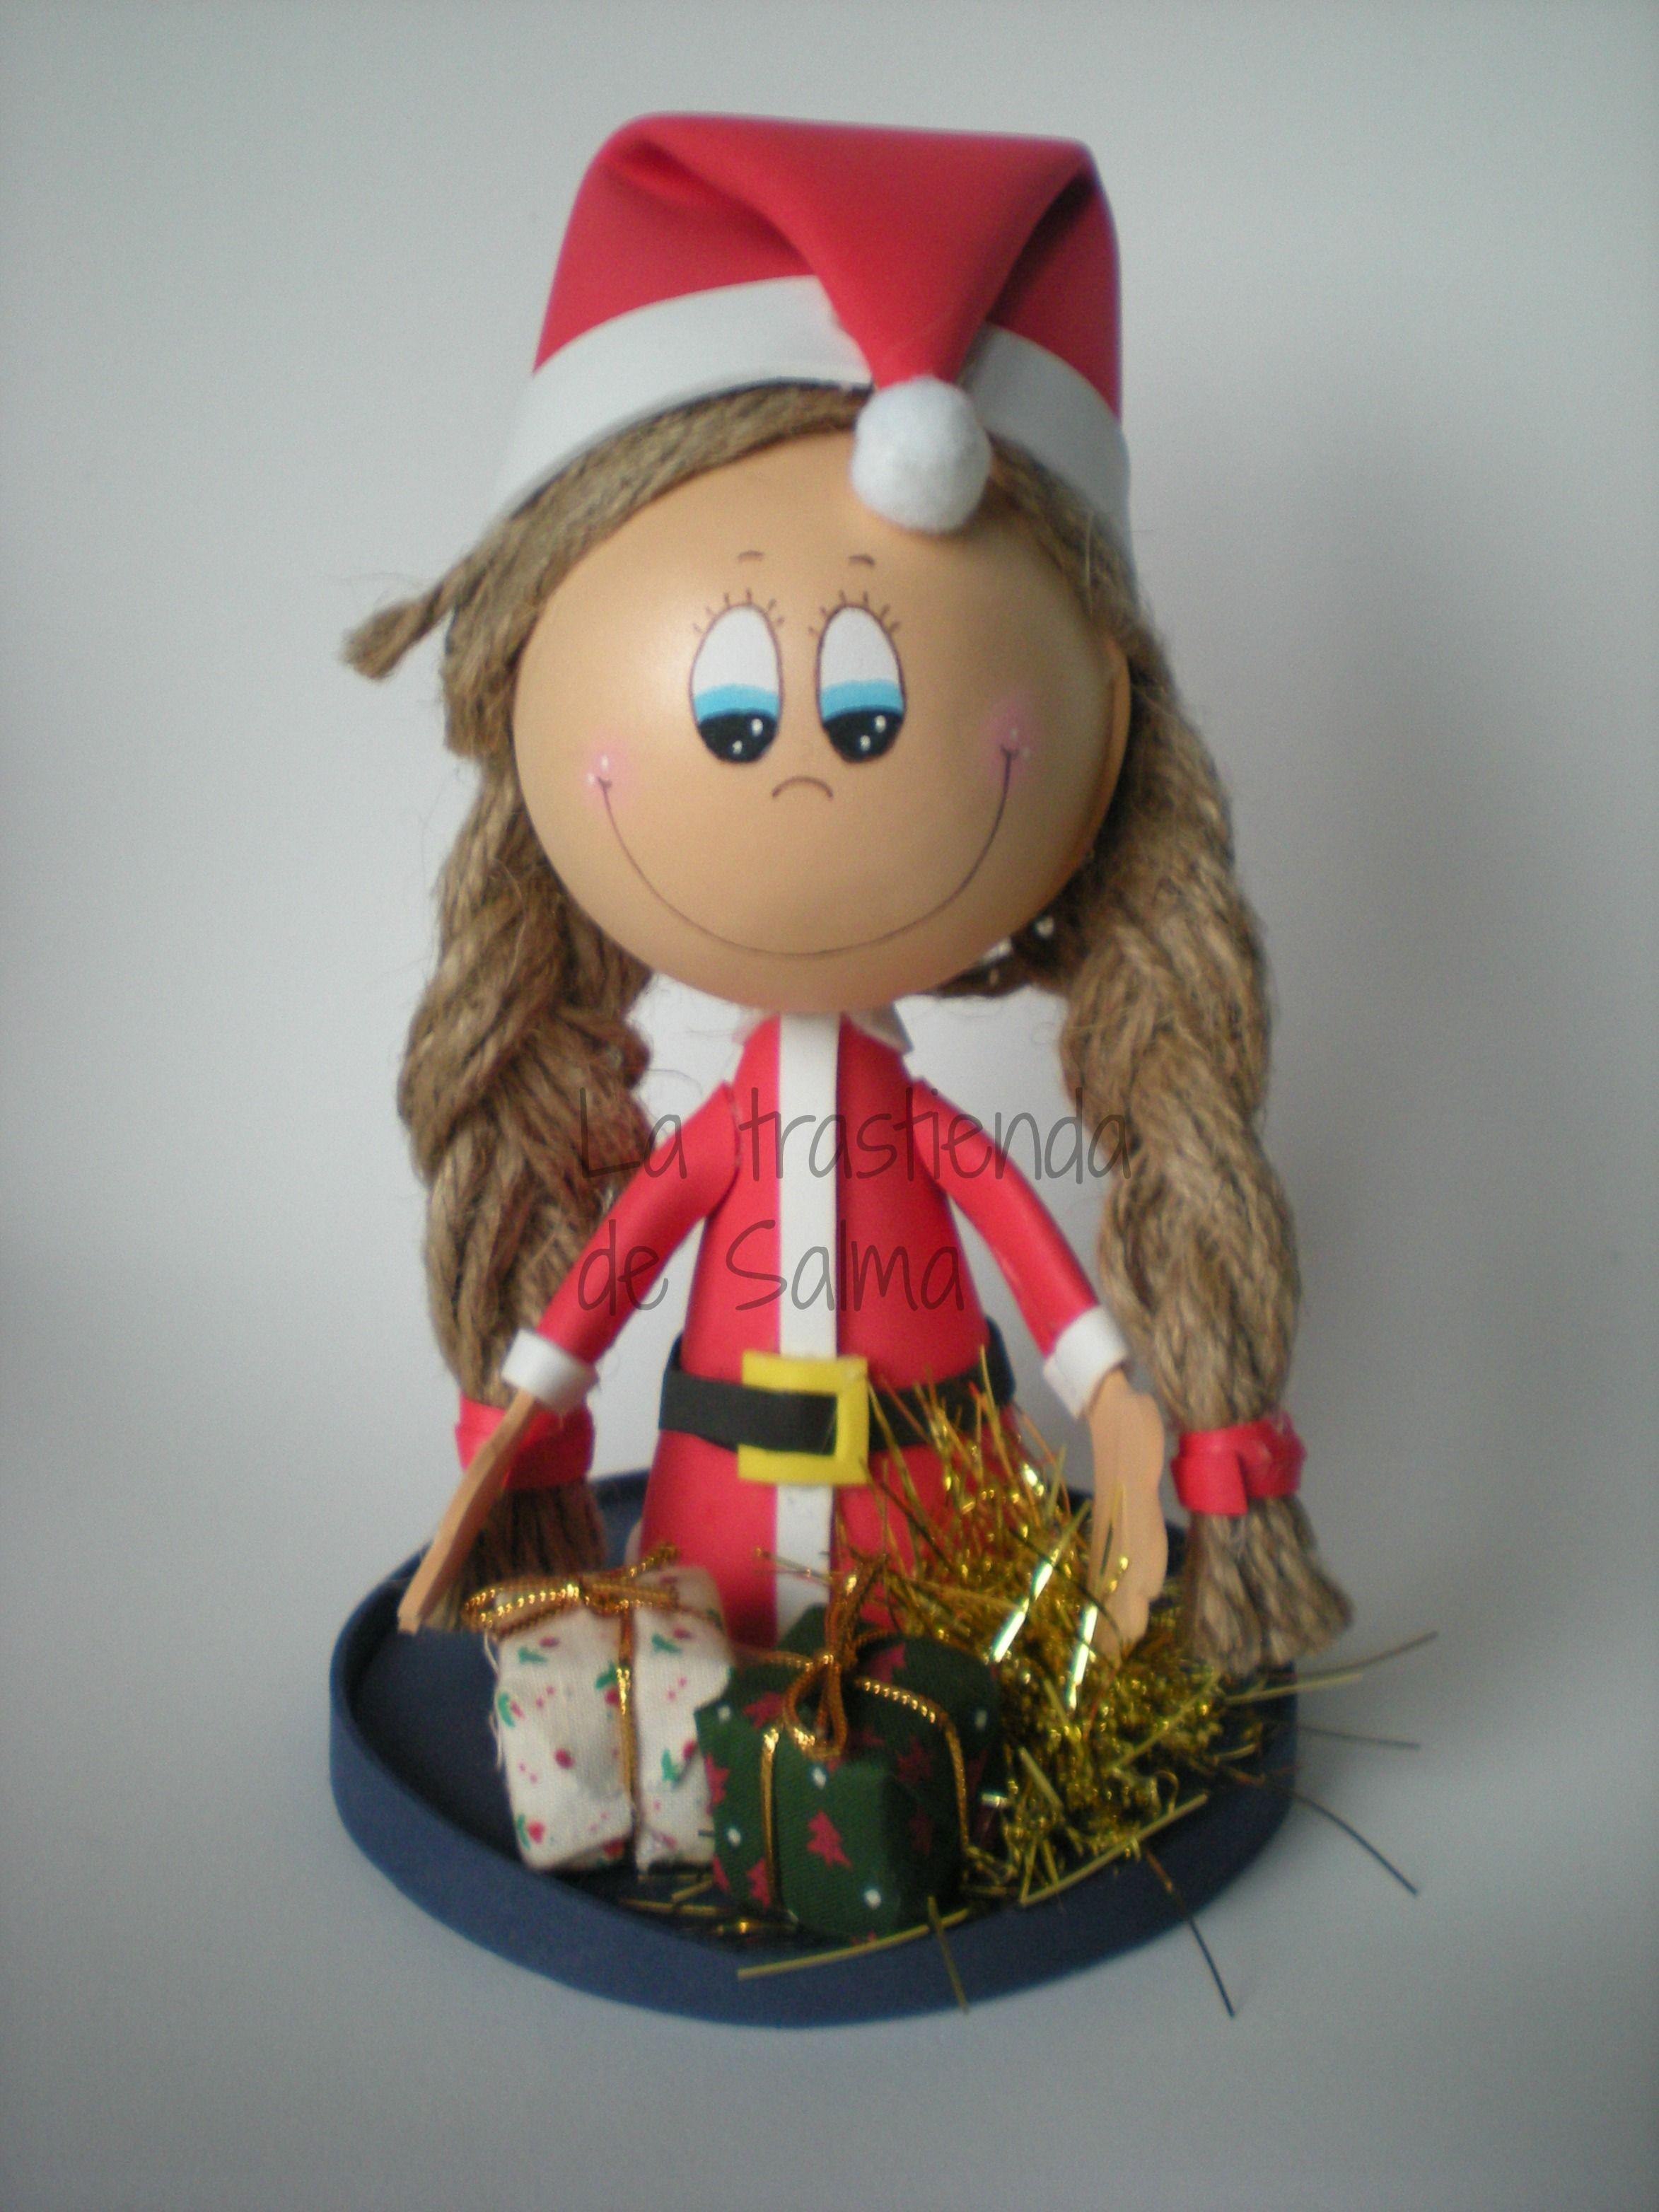 fofucha con adornos navideos tamao cm precio euros gastos de envio gratis